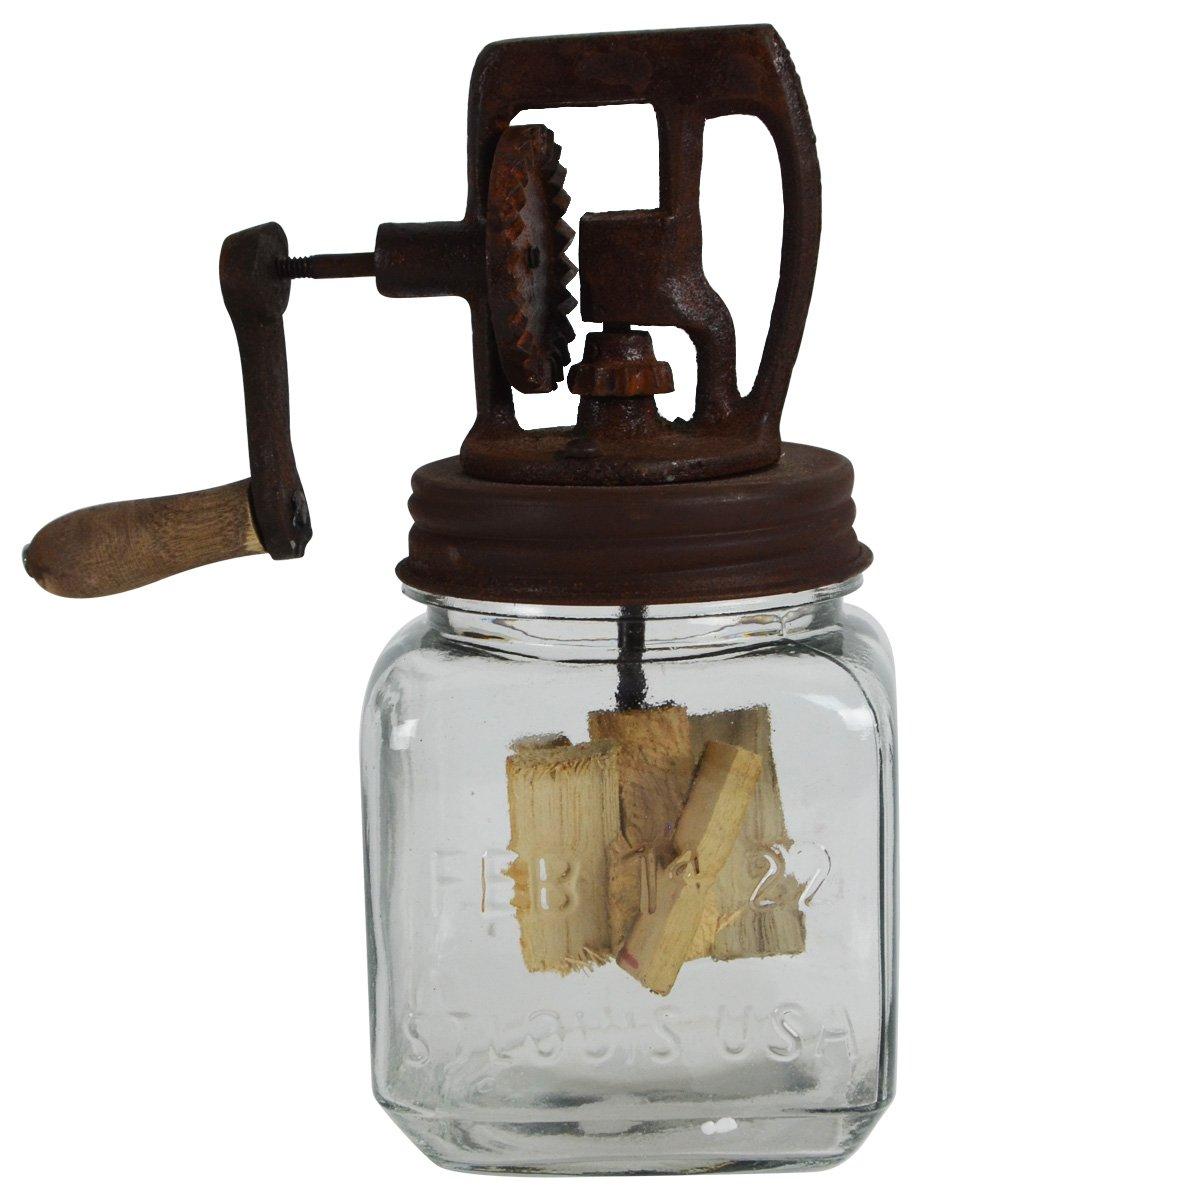 Rustic Antique Style Dazey Glass Hand Crank 1 Quart Butter Churn Primitive Decor by Dazey